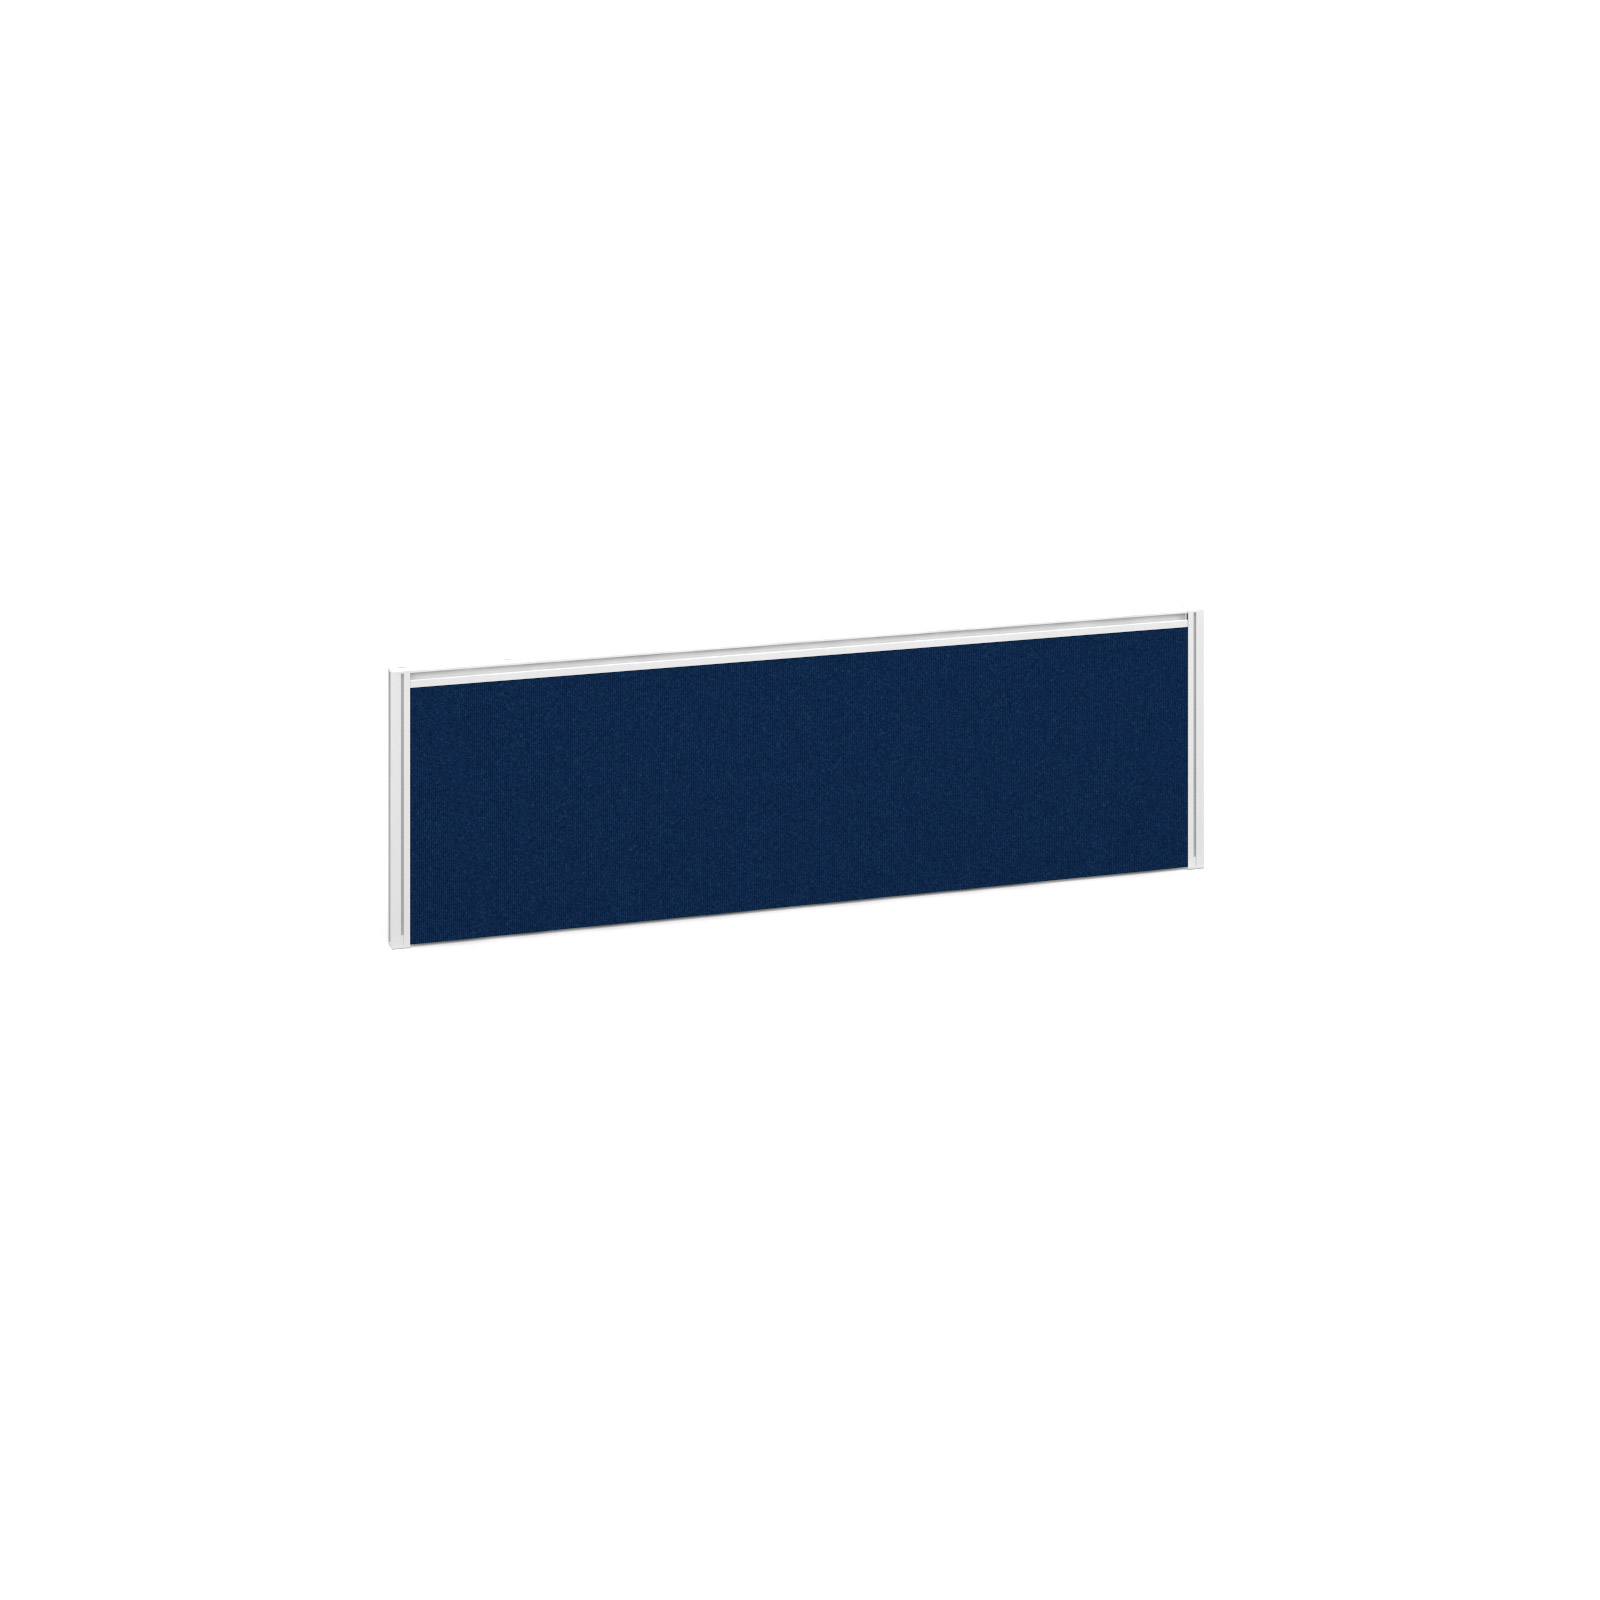 Straight fabric desktop screen 1200mm x 380mm - blue fabric with white aluminium frame